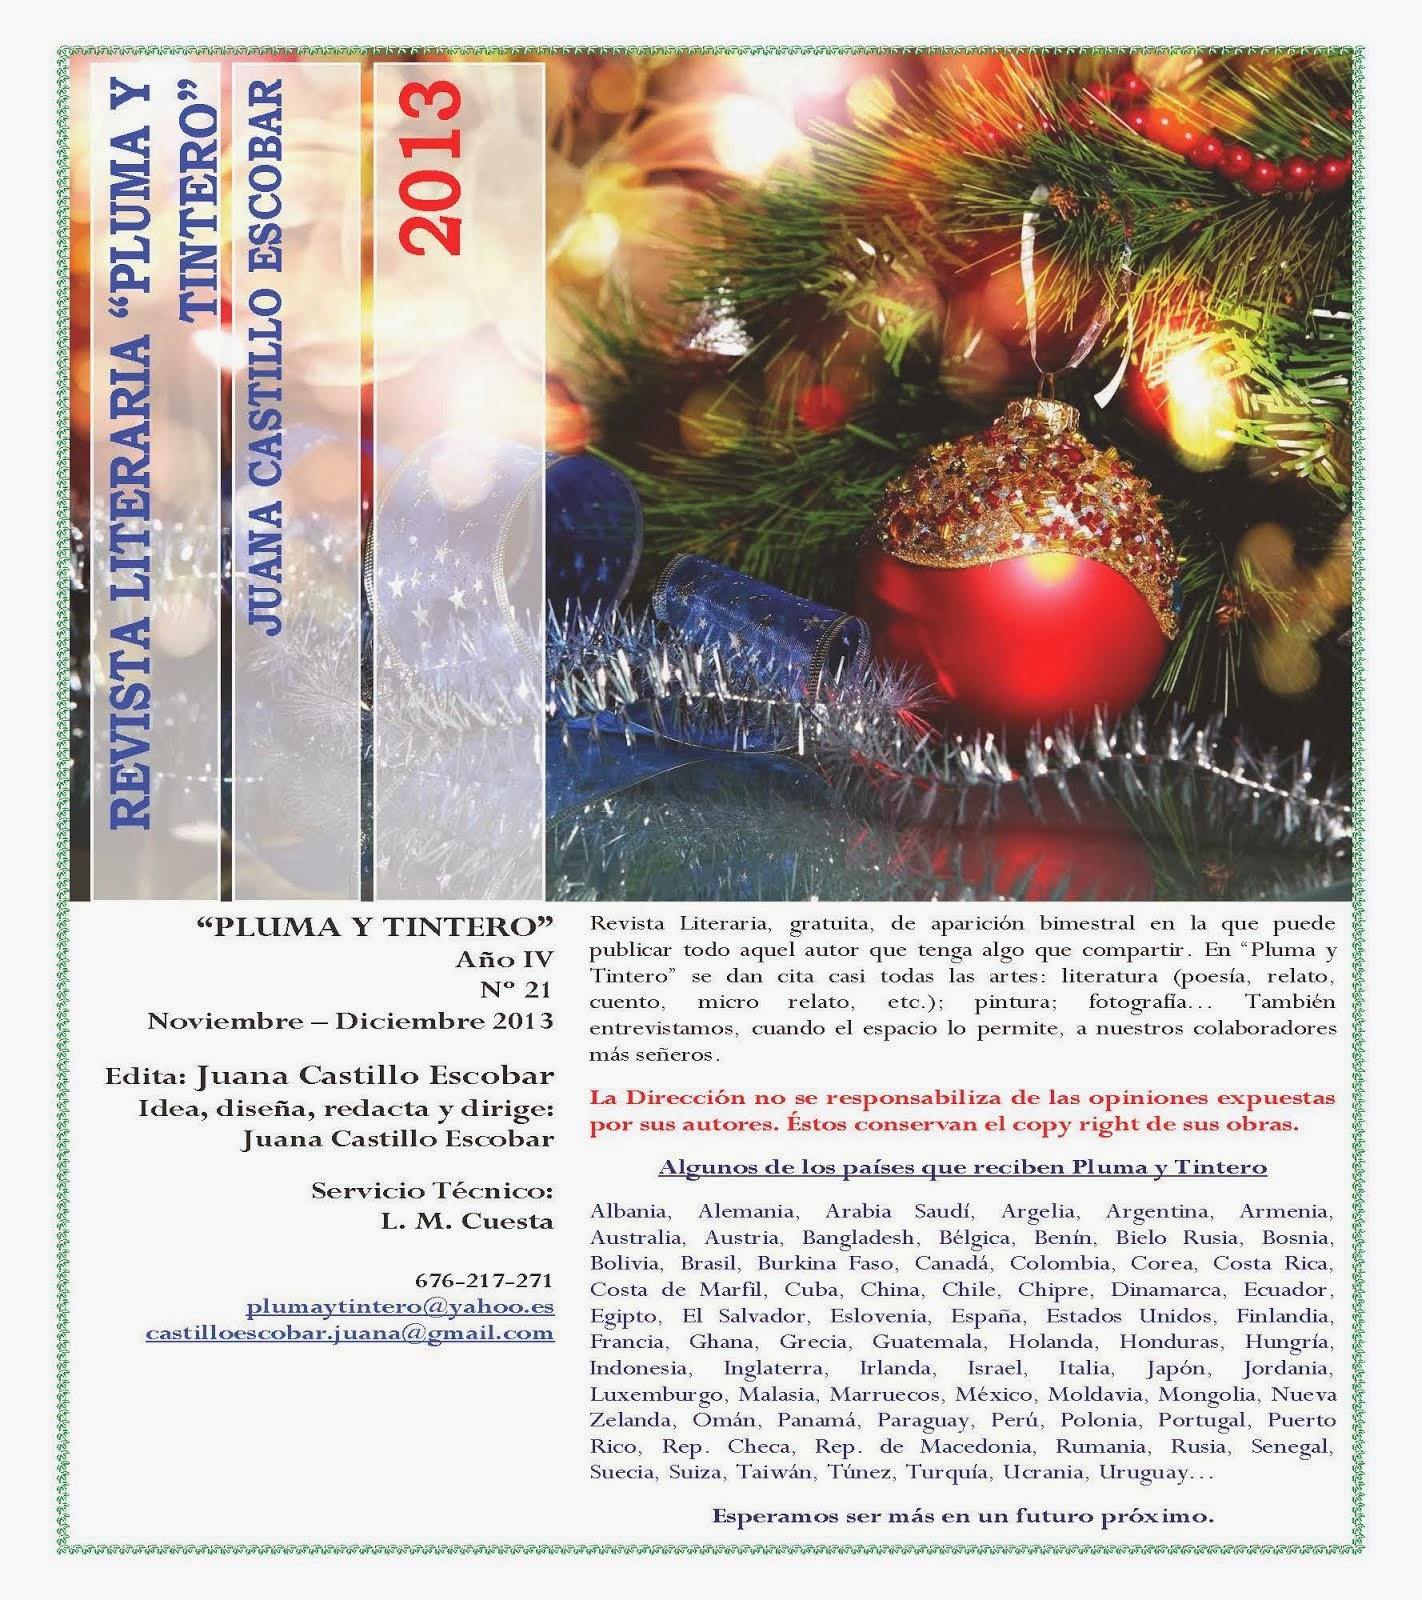 Nº 21 - Año IV - Noviembre-Diciembre 2013